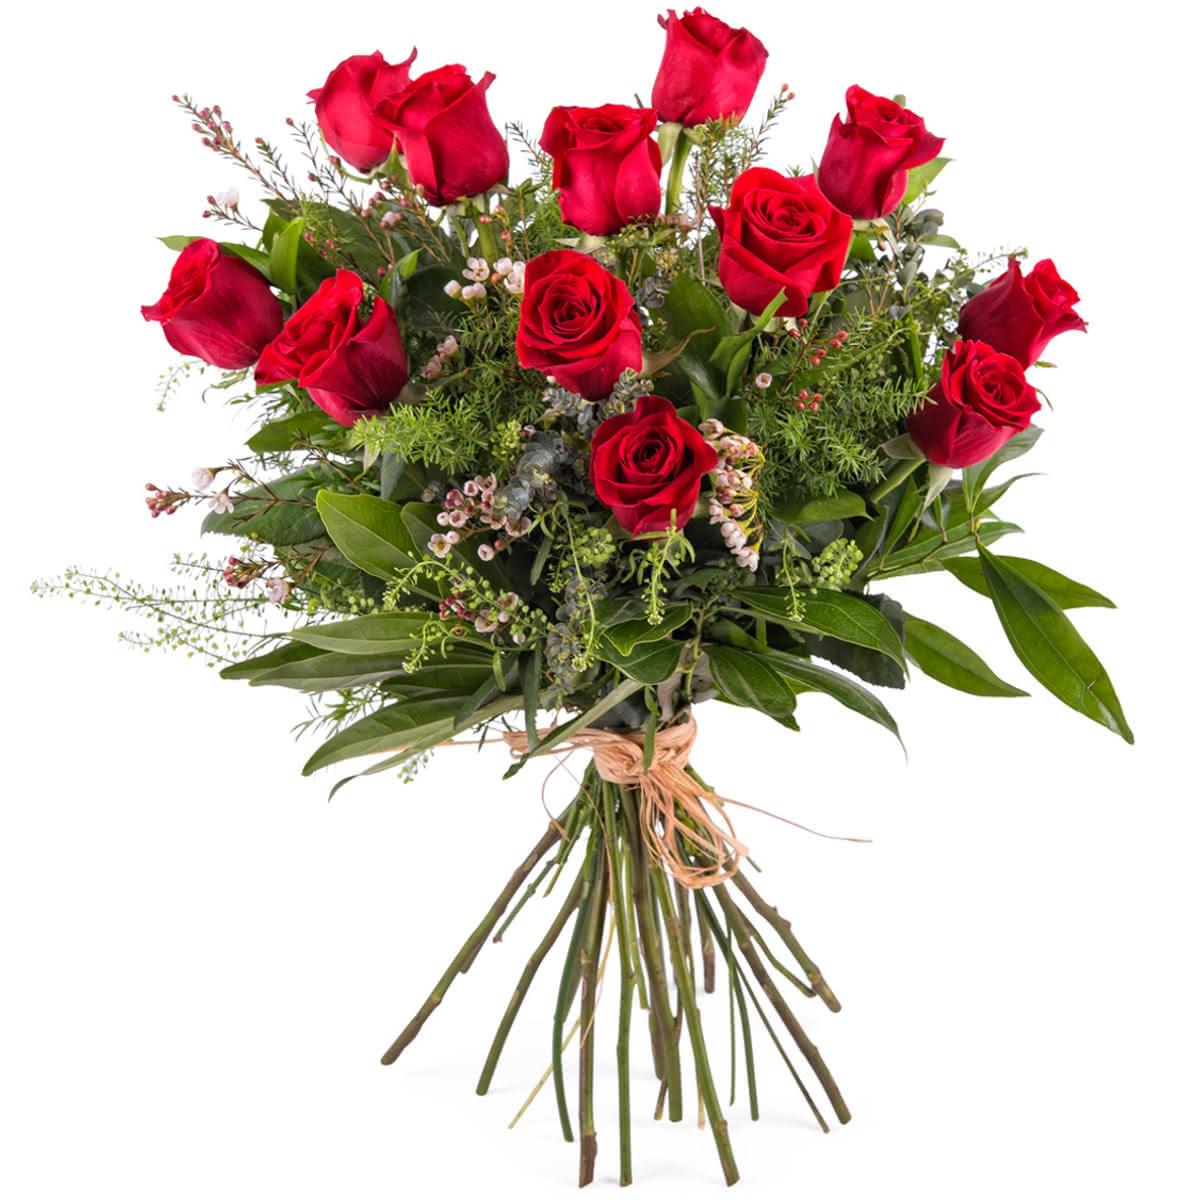 Amor, 12 Rosas Rojas de Tallo Largo